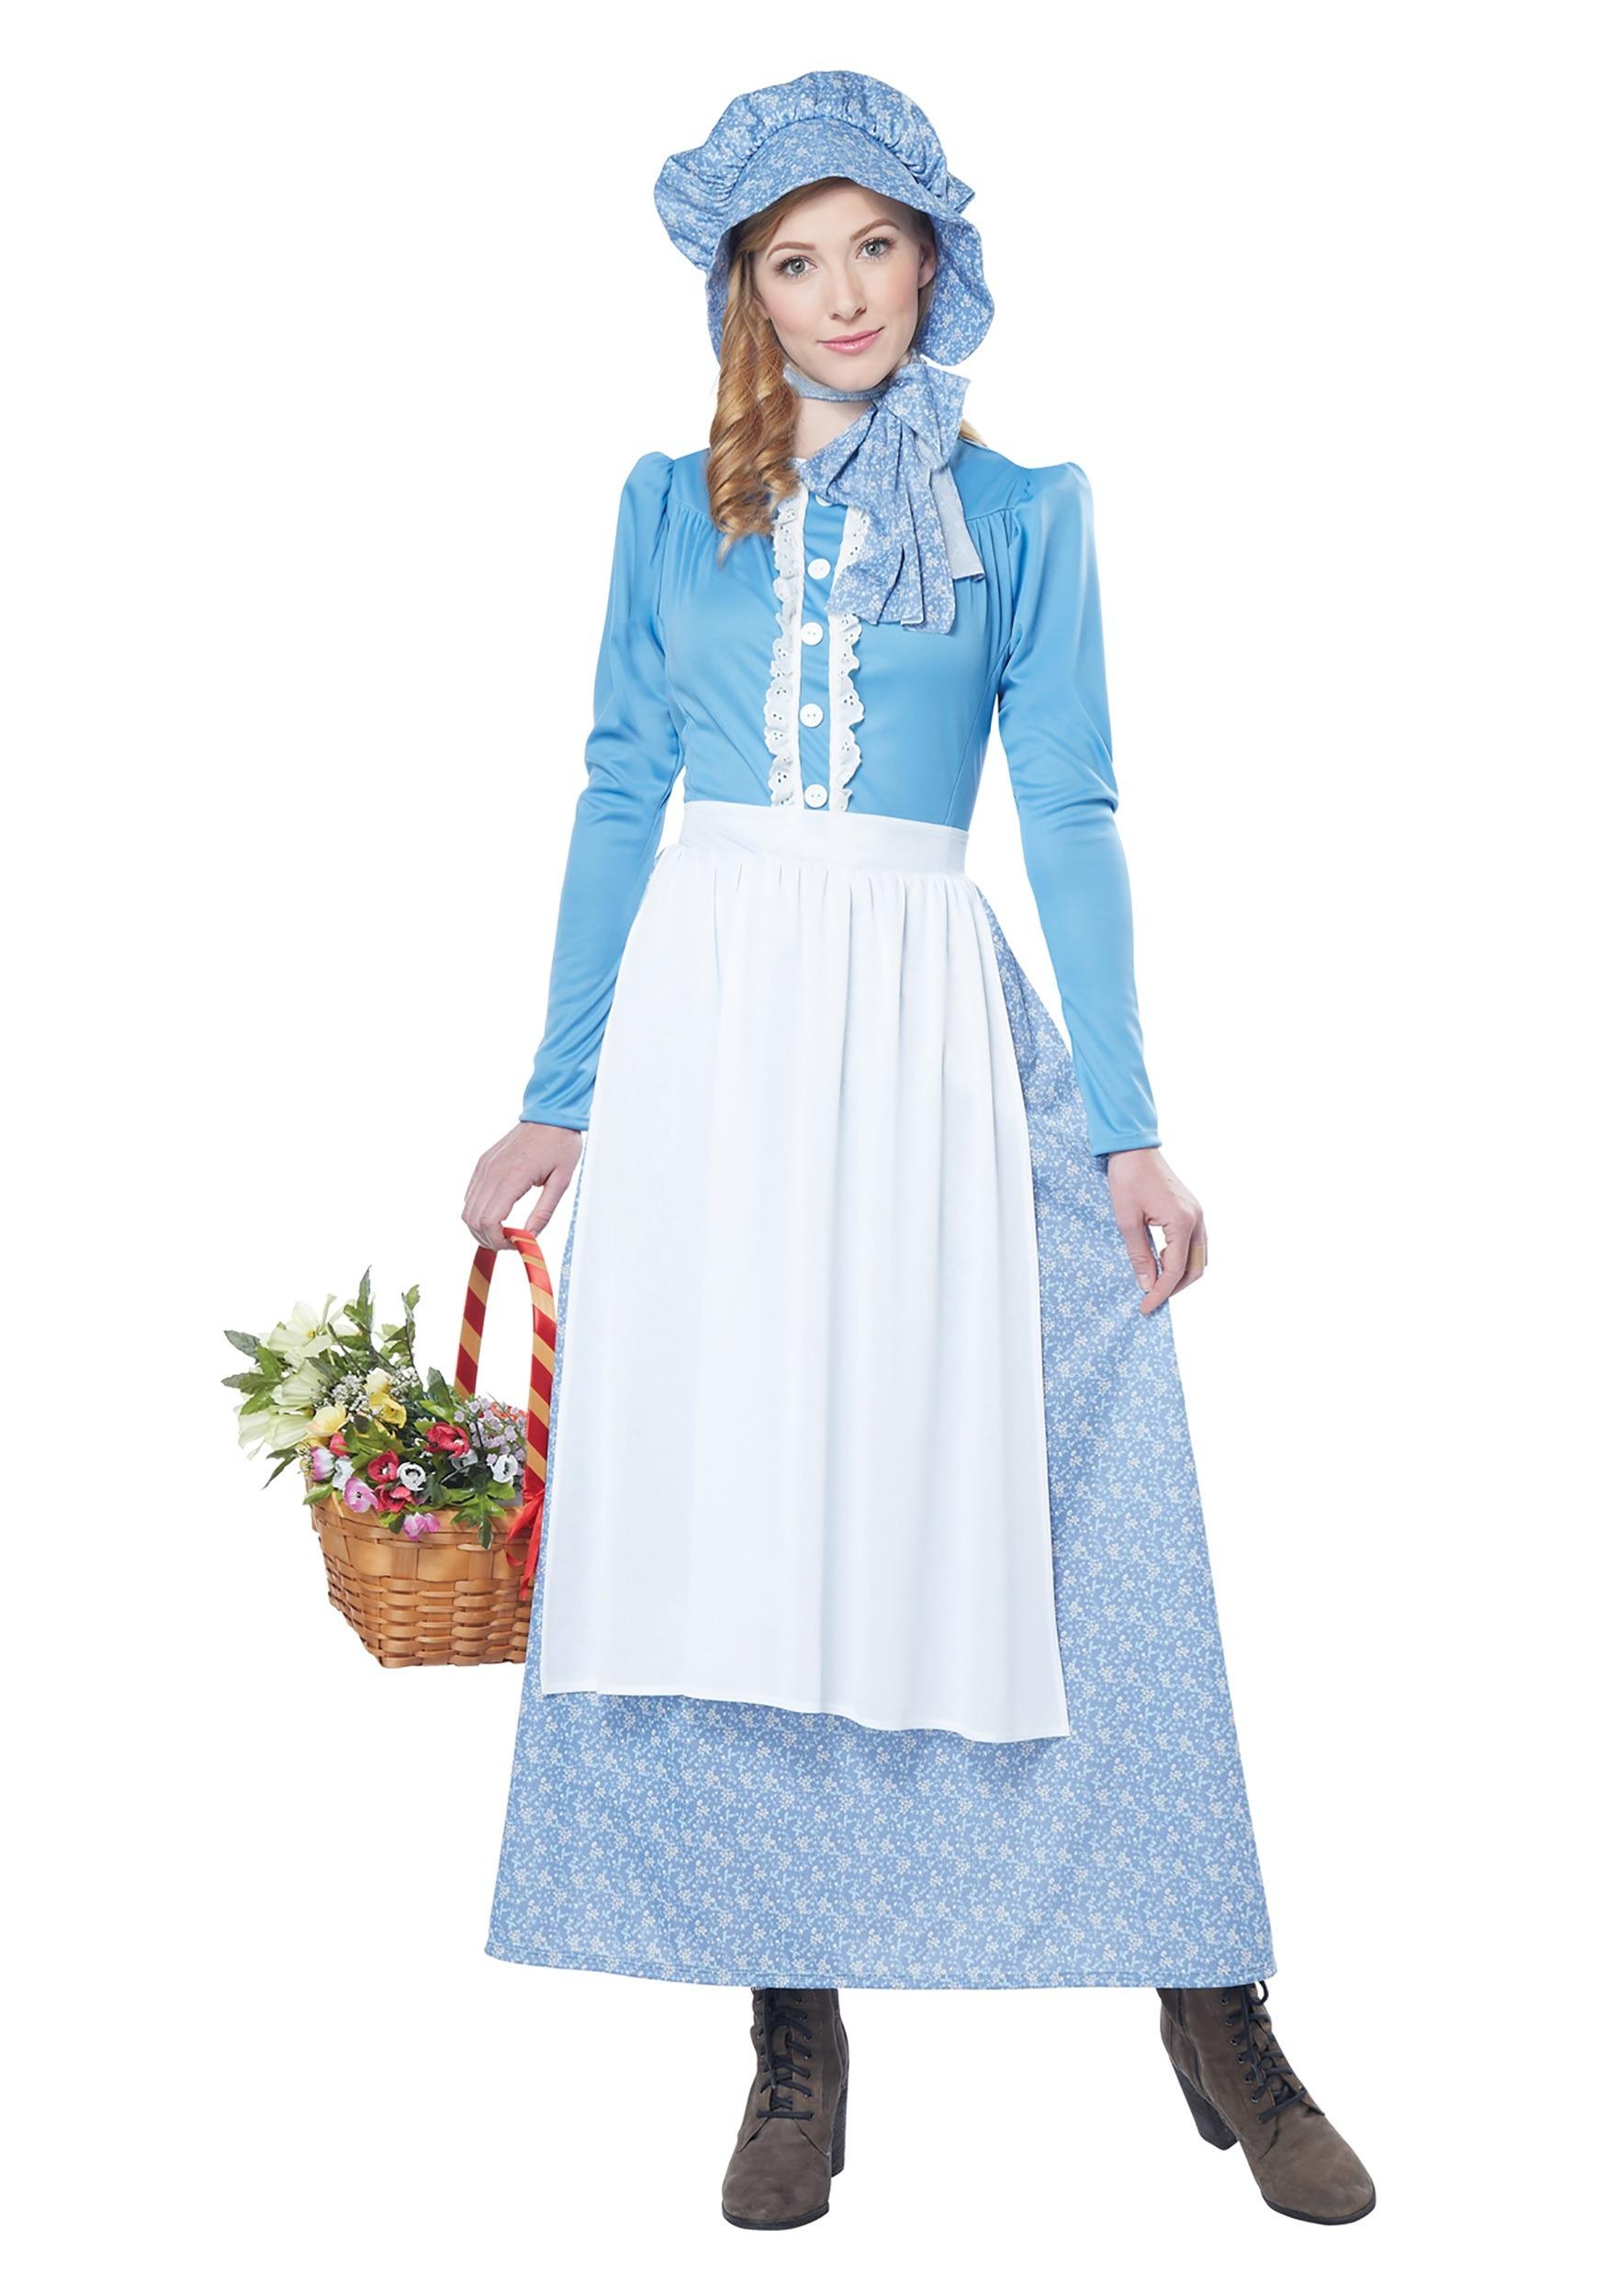 Women's Pioneer Woman Costume